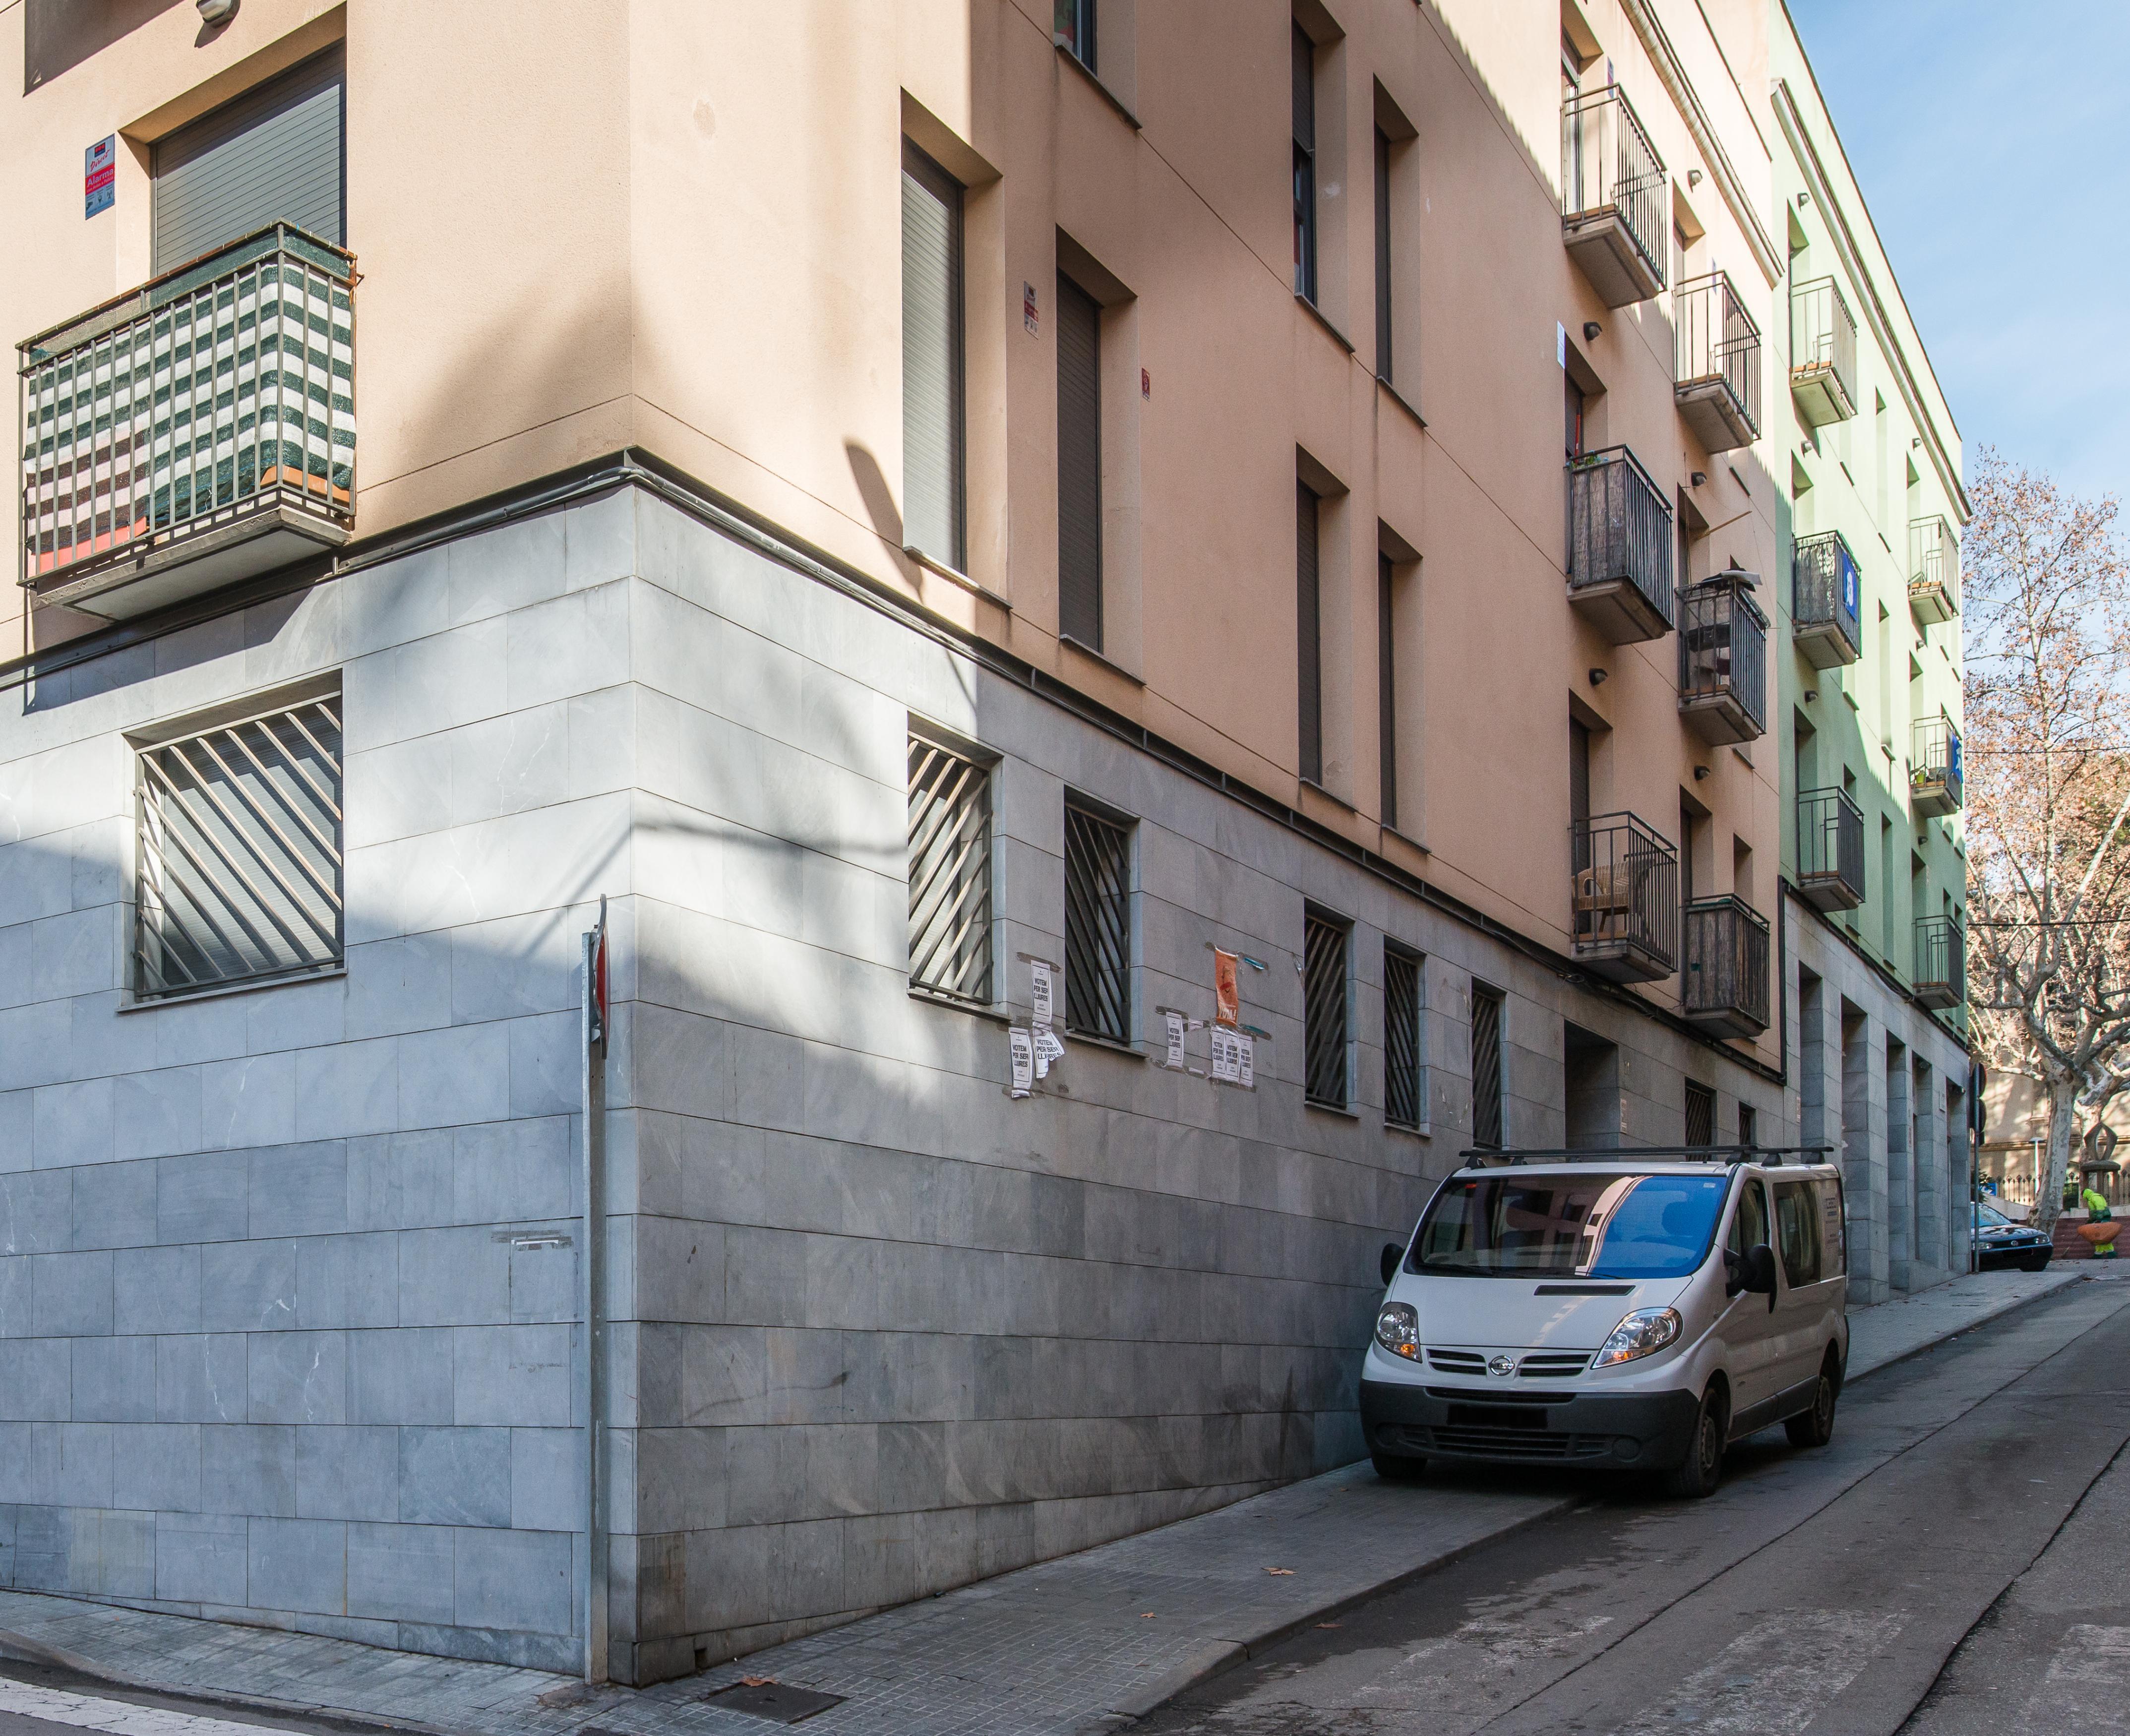 Piso en venta en Centre Històric de Manresa, Manresa, Barcelona, Calle Hospital, 77.800 €, 67 m2